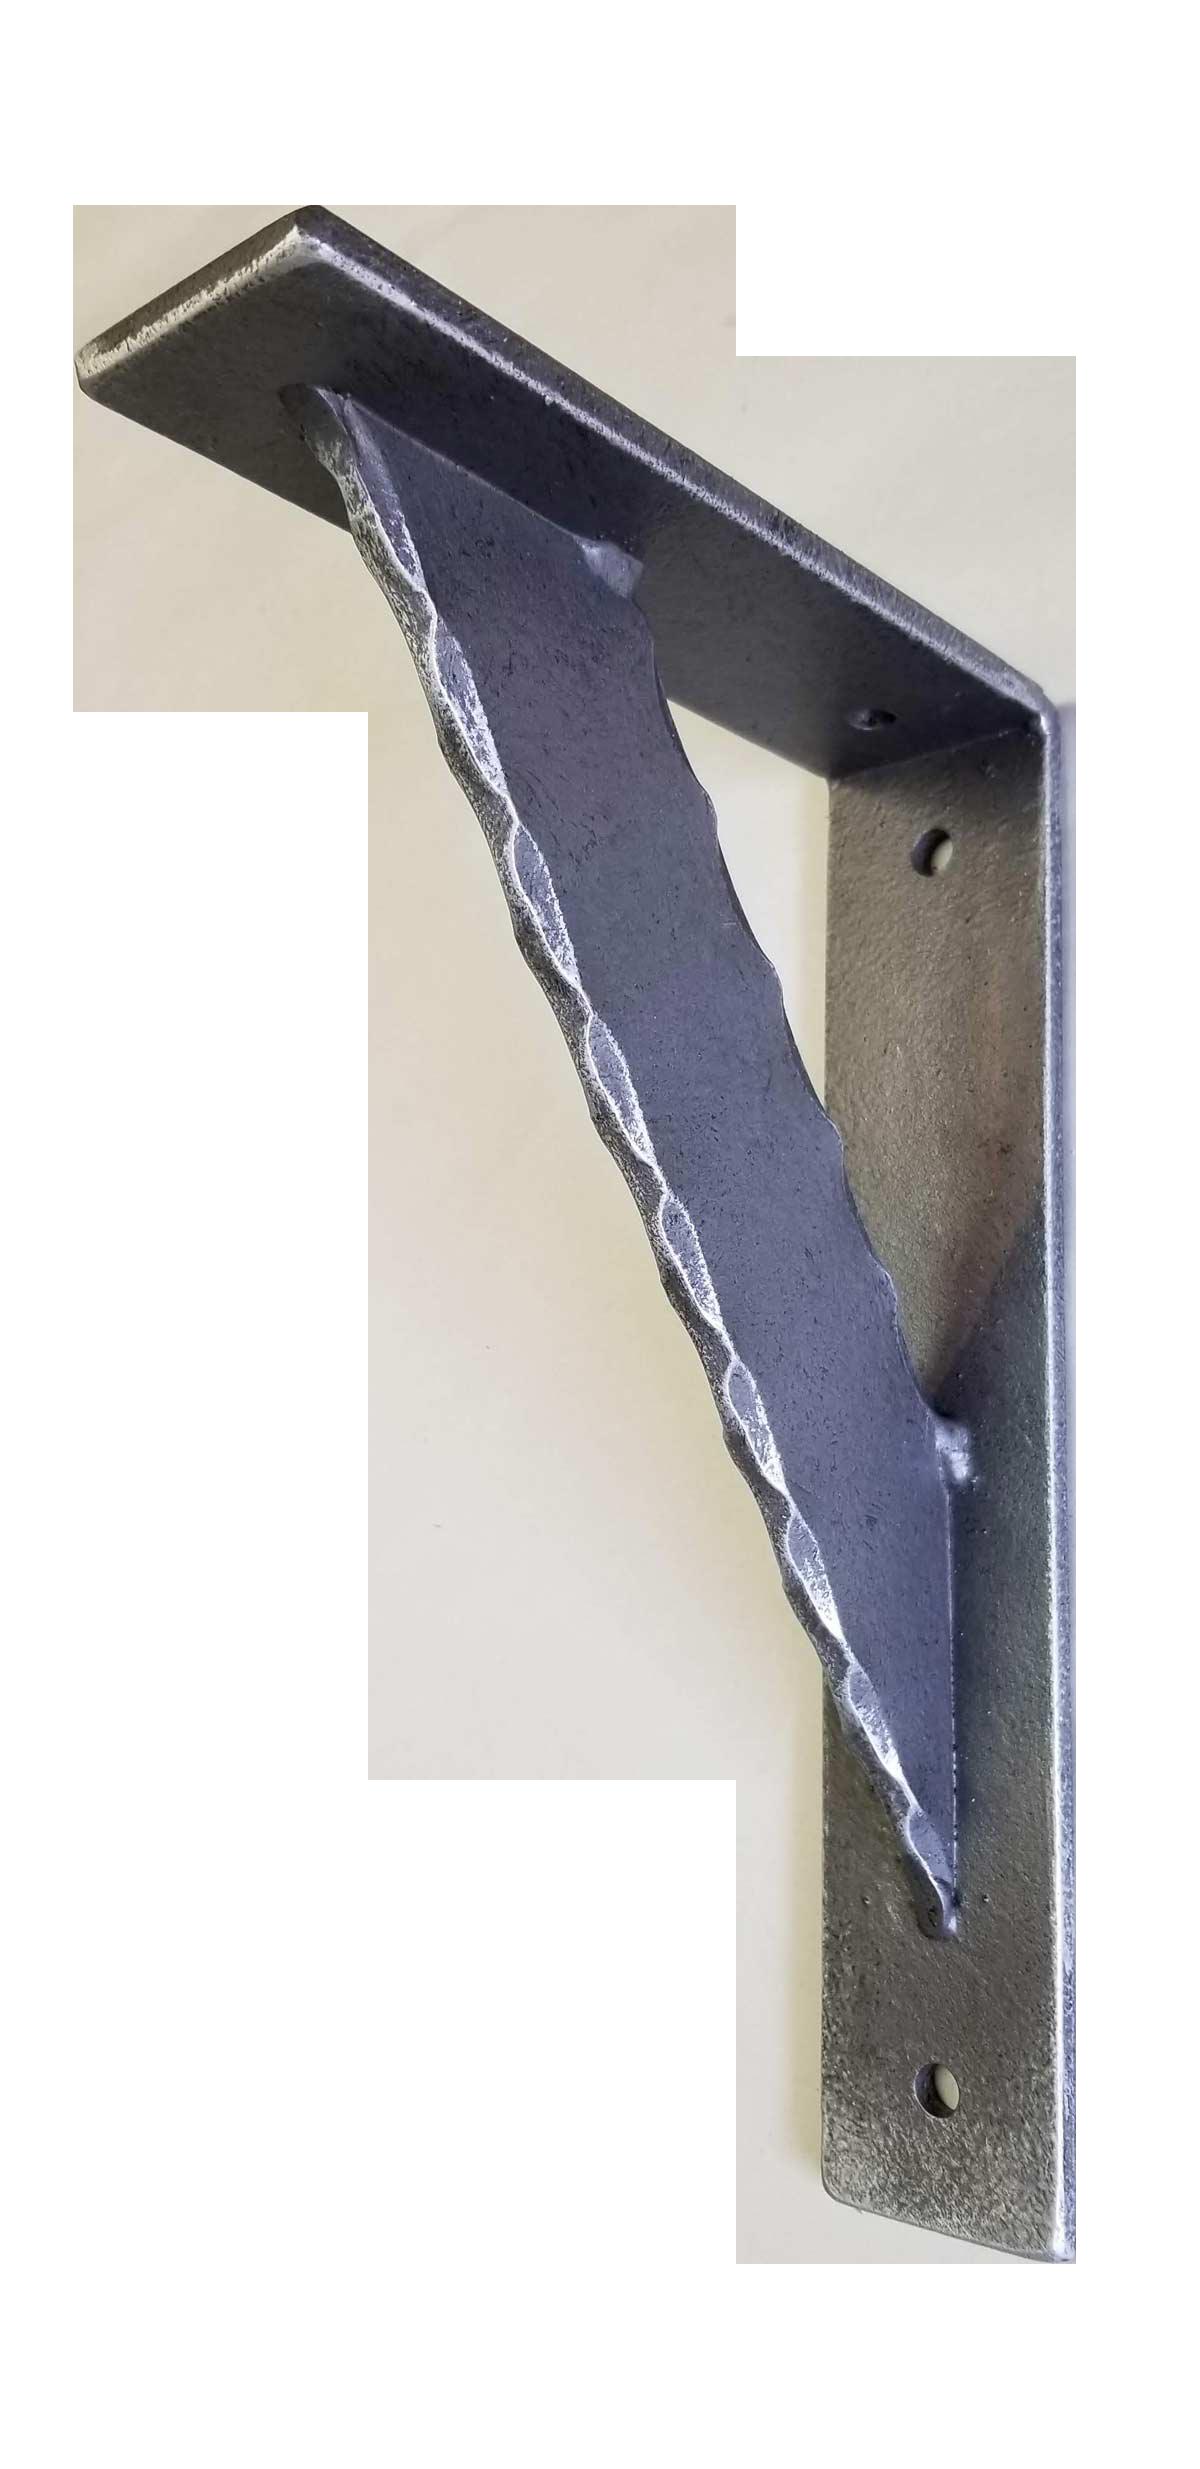 Picture of: Heavy Duty Decorative Corbel Countertops Mantels Shelving Shoreline Ornamental Iron